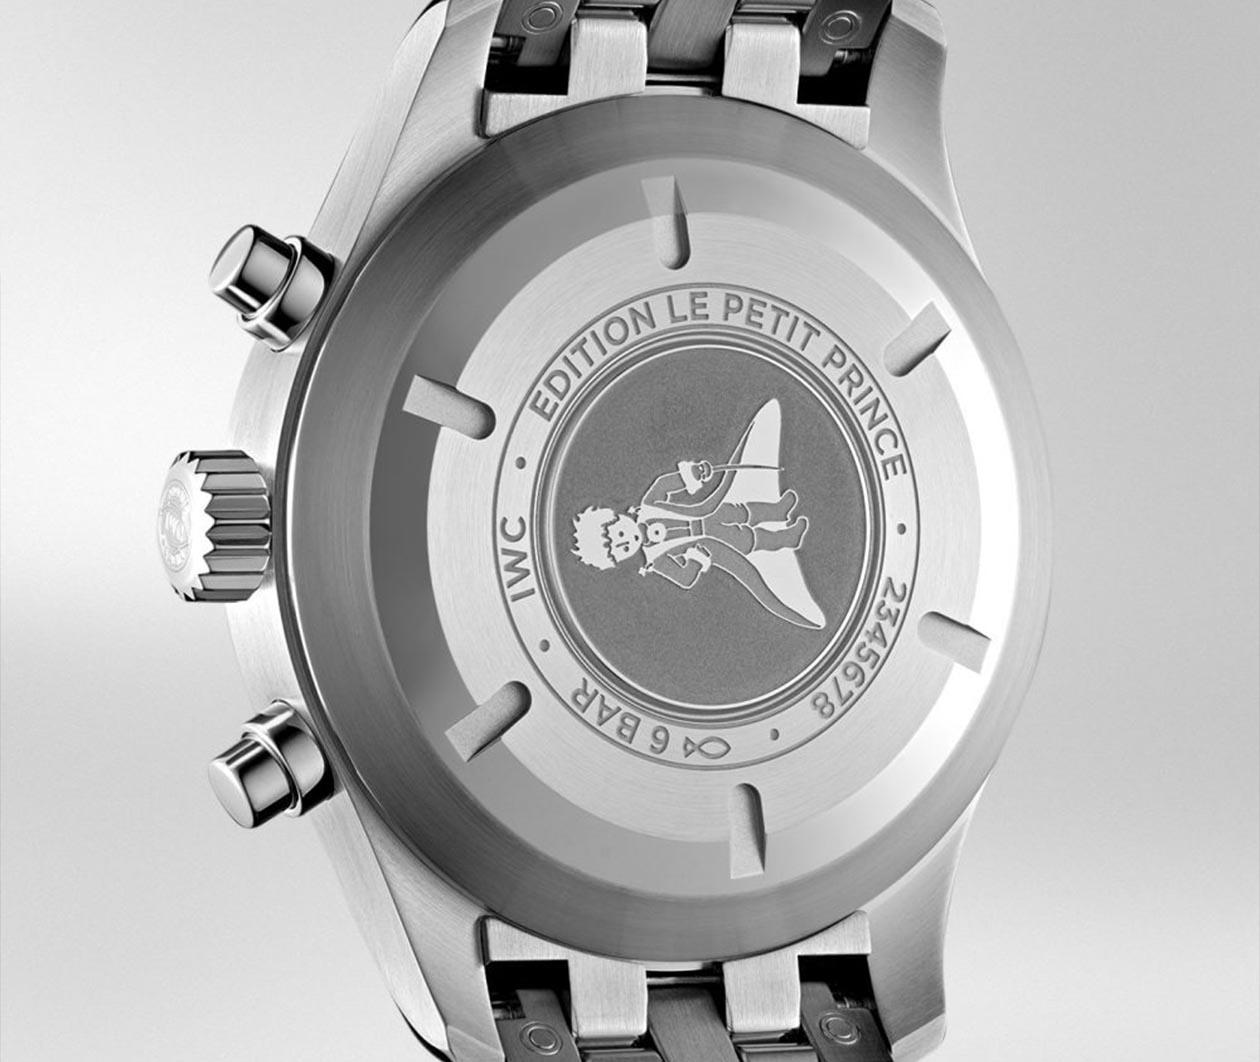 IWC PilotsWatch ChronographEditionLePetitPrince IW377717 Carousel 5 FINAL